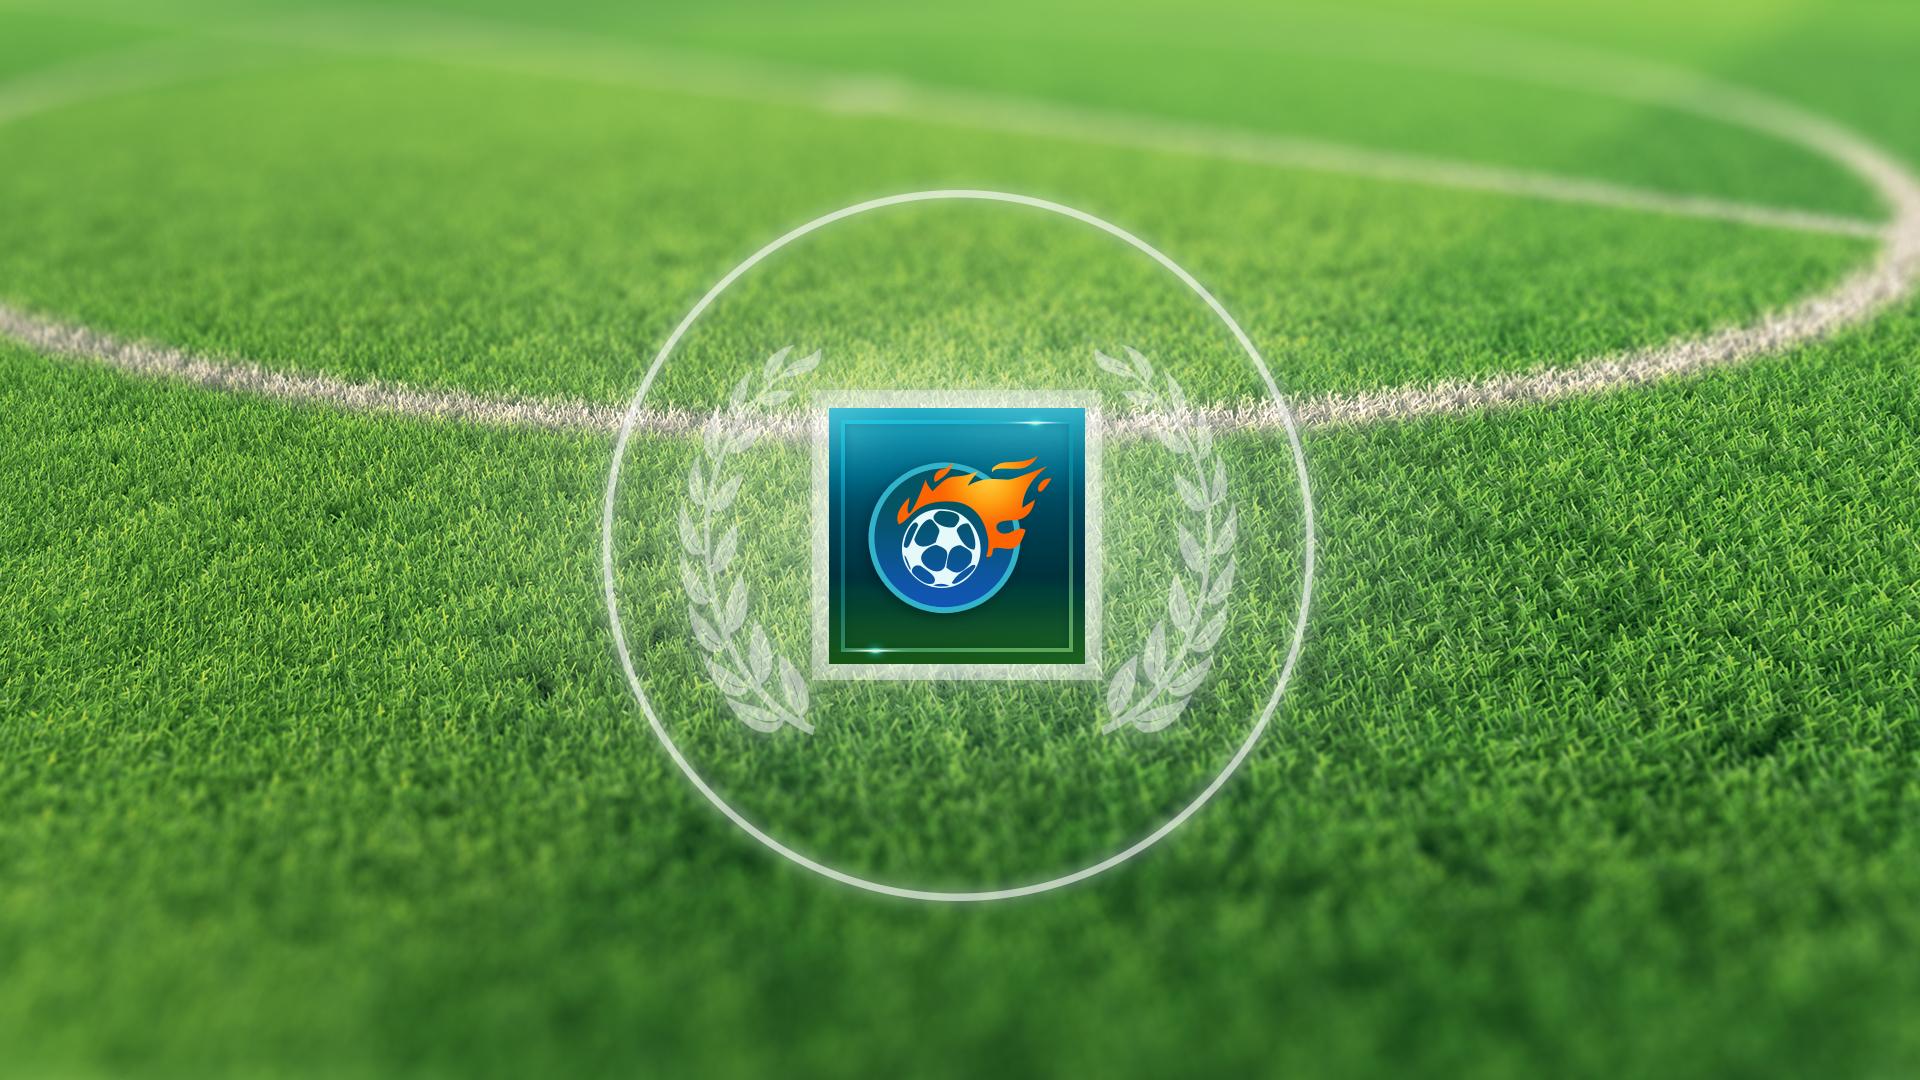 Сannoneer achievement for Football, Tactics & Glory on Xbox One